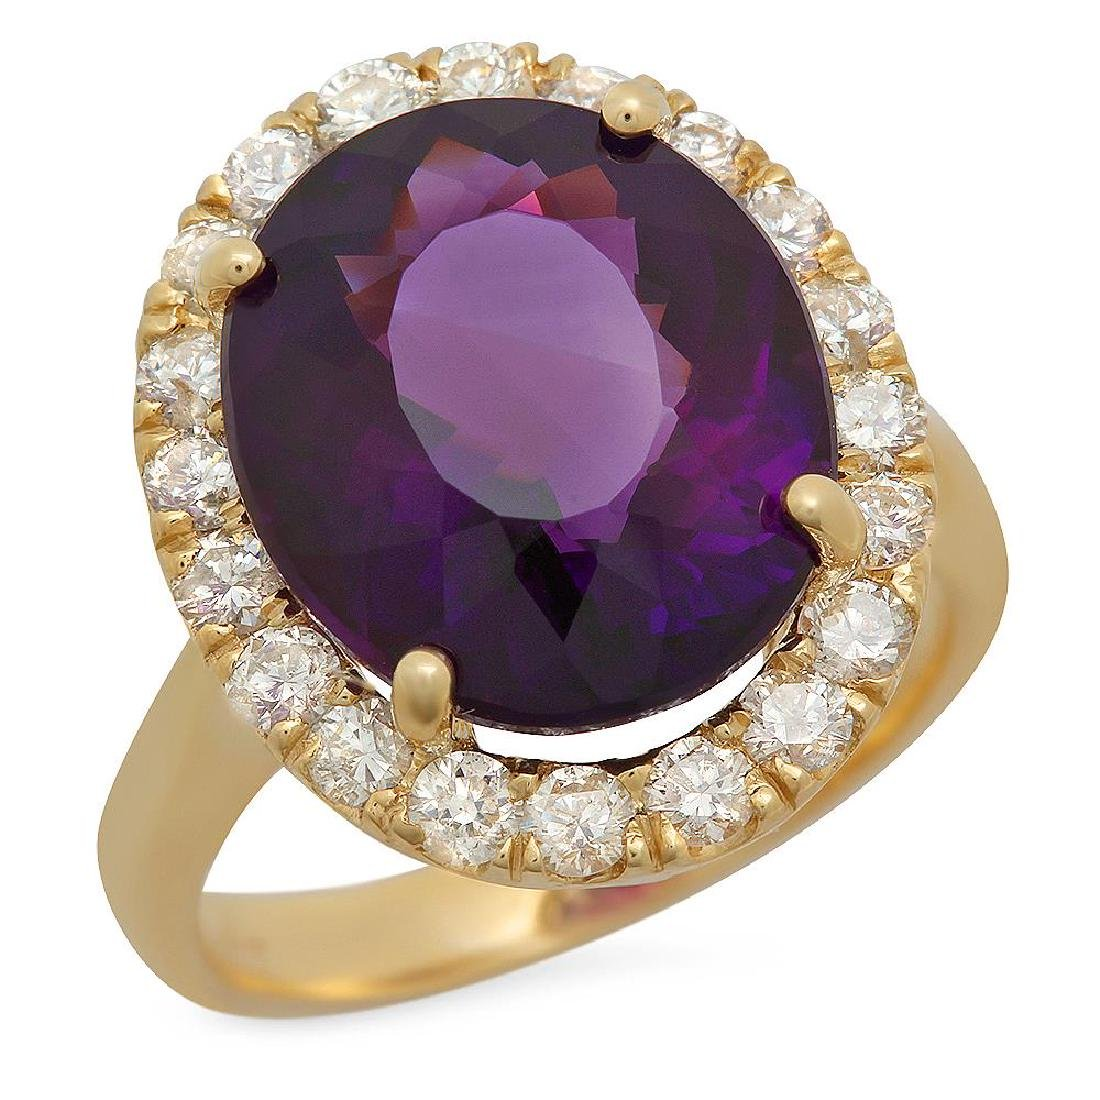 14K Gold 7.20ct Amethyst 1.10ct Diamond Ring